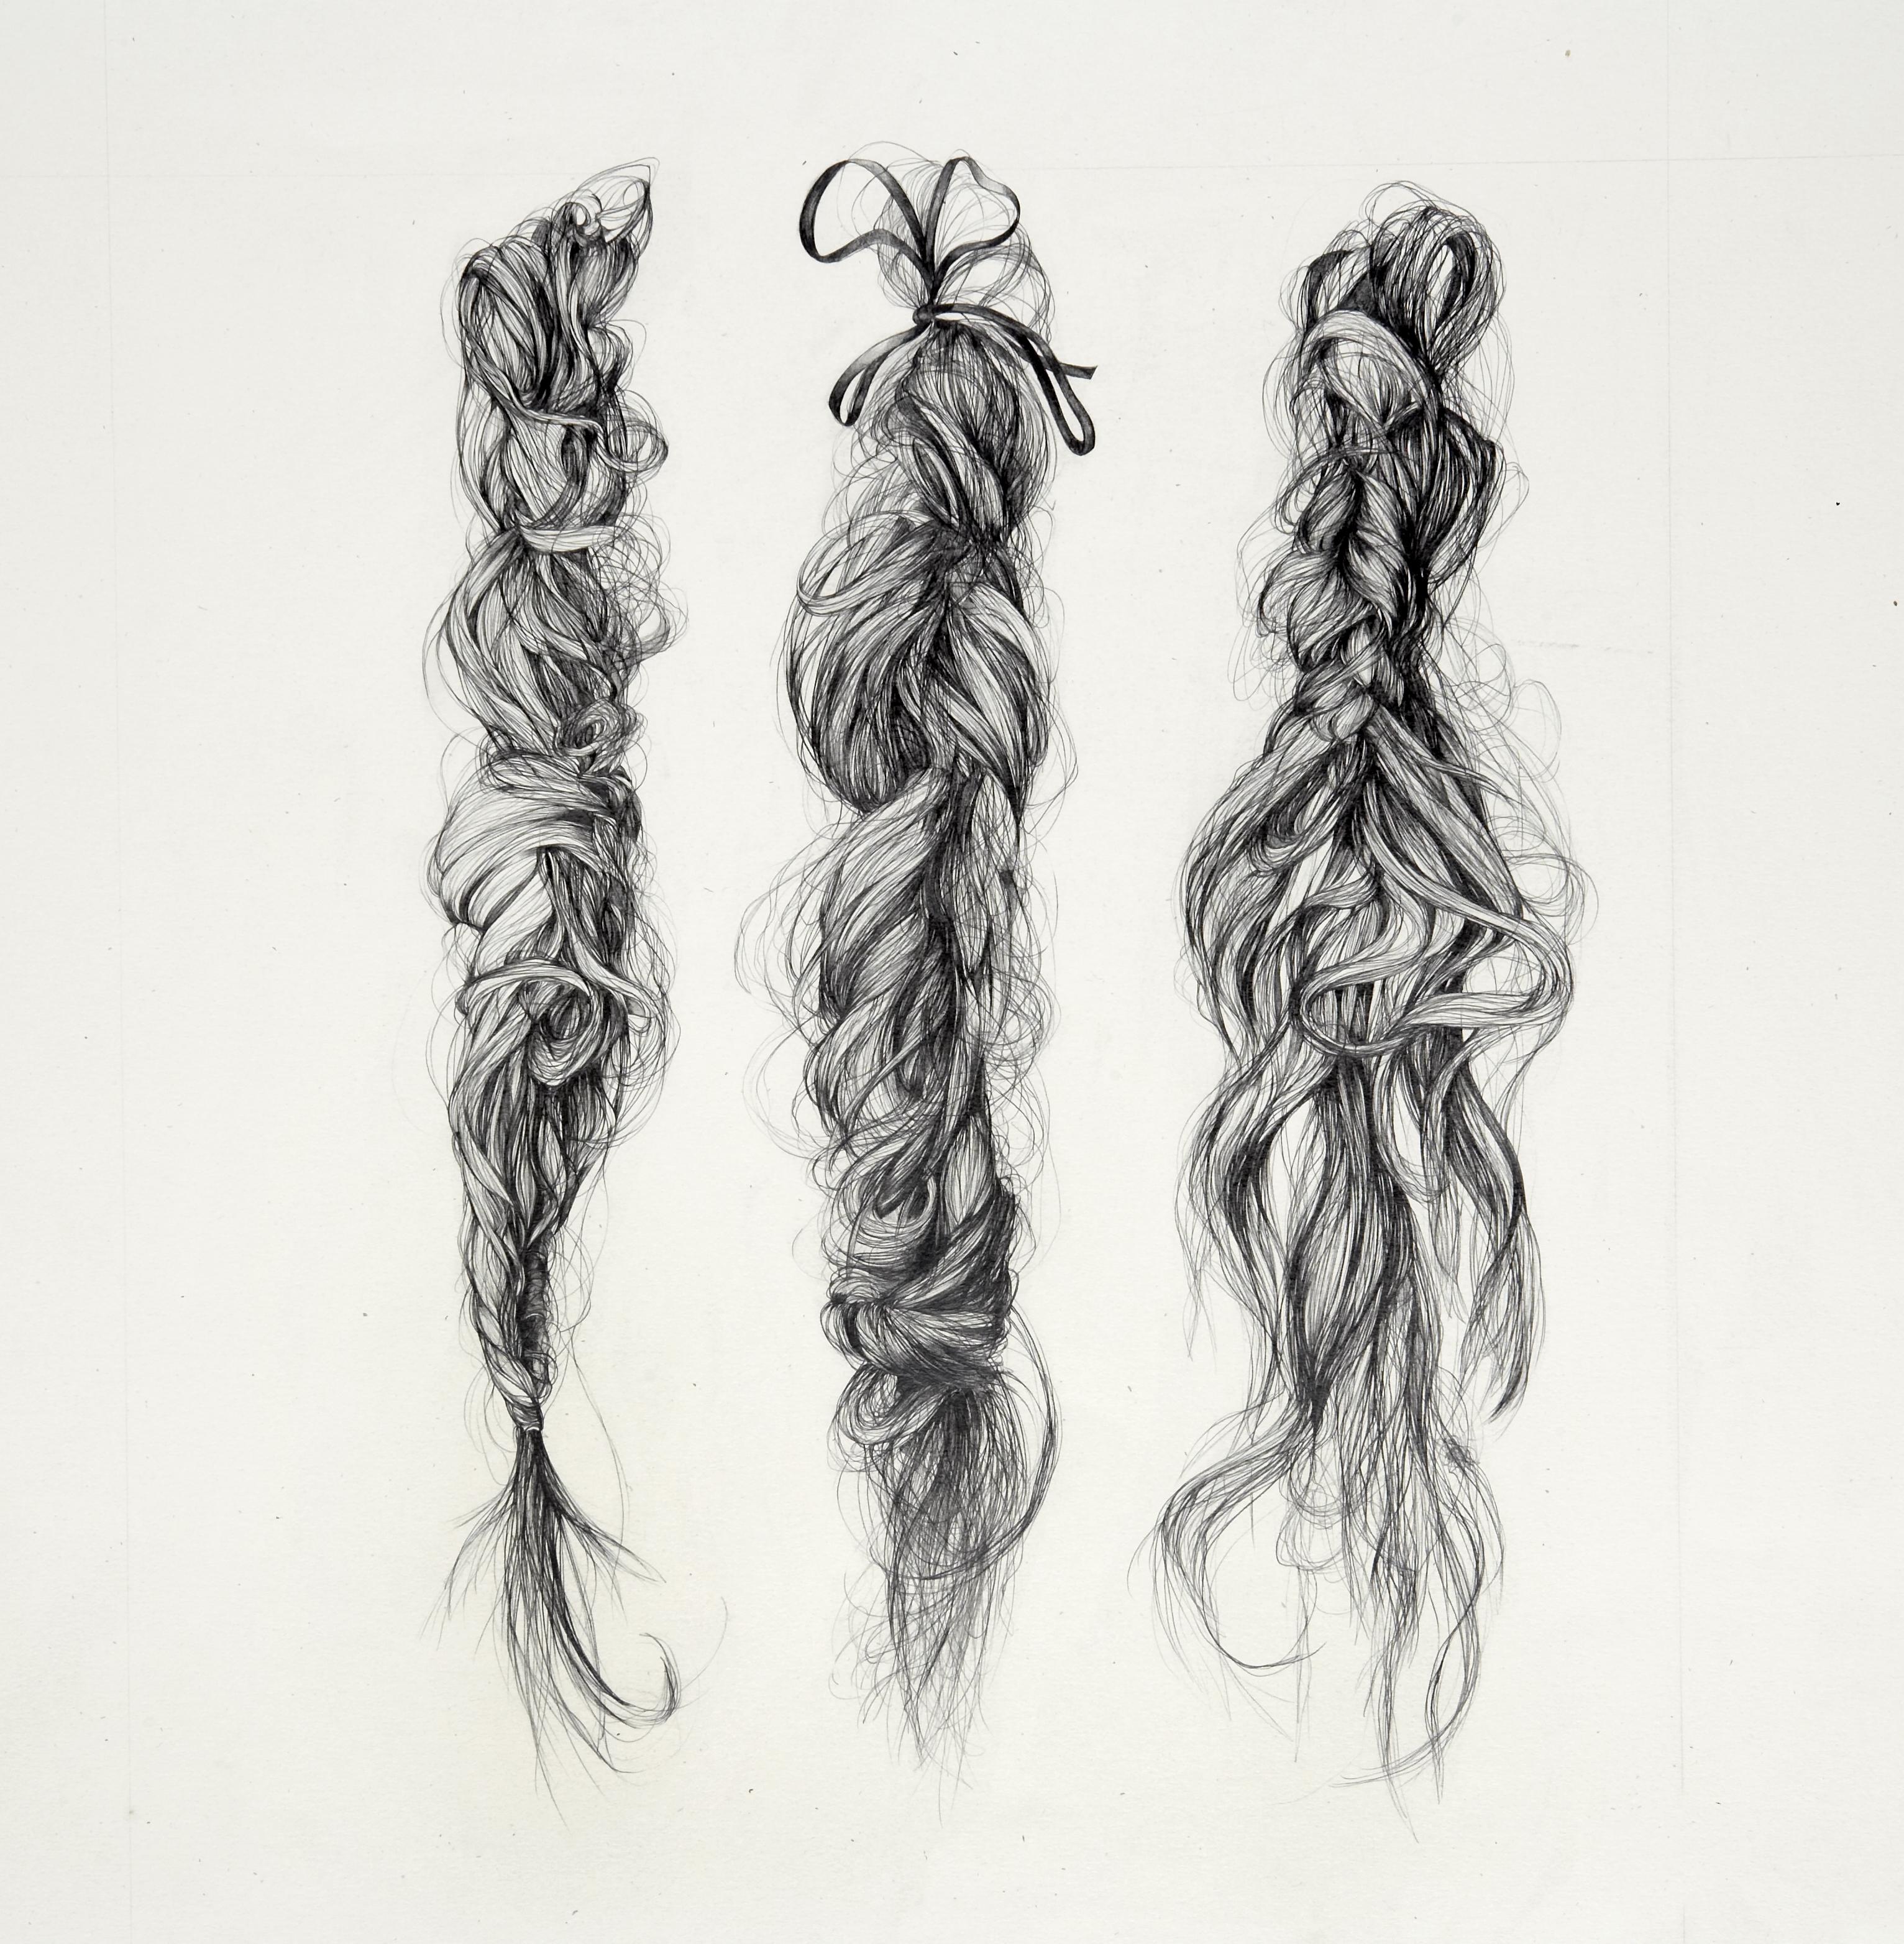 10 ft long hair